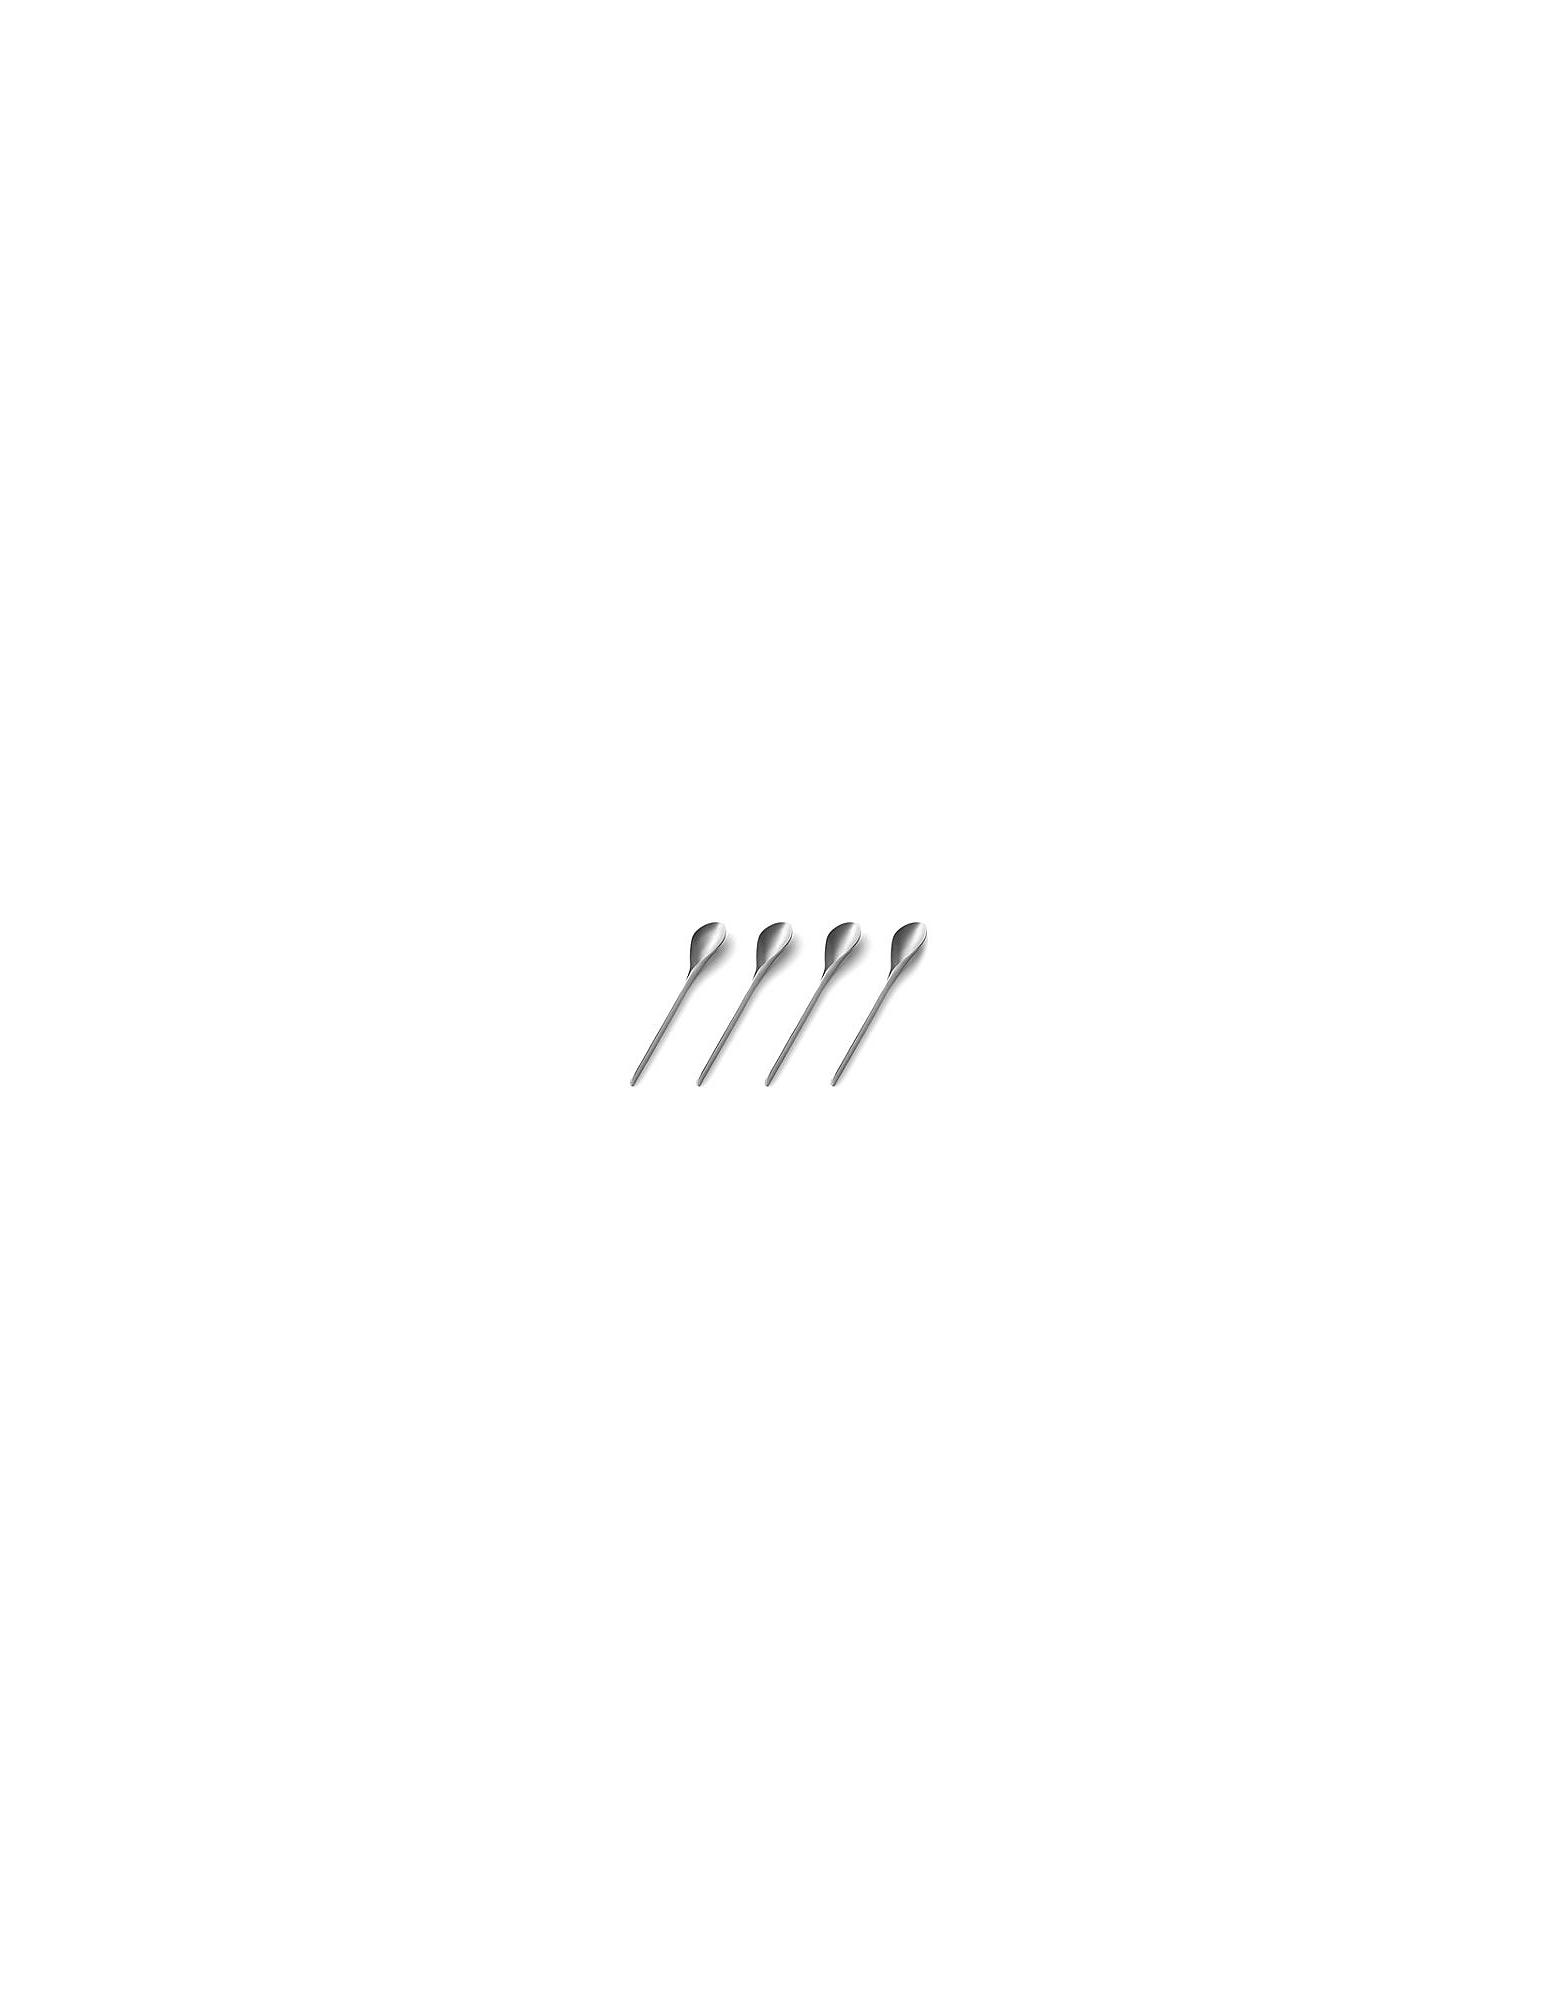 Alessi Kitchen & Dining, E-Li-Li - Set of 4 Stainless Steel Coffee Spoons